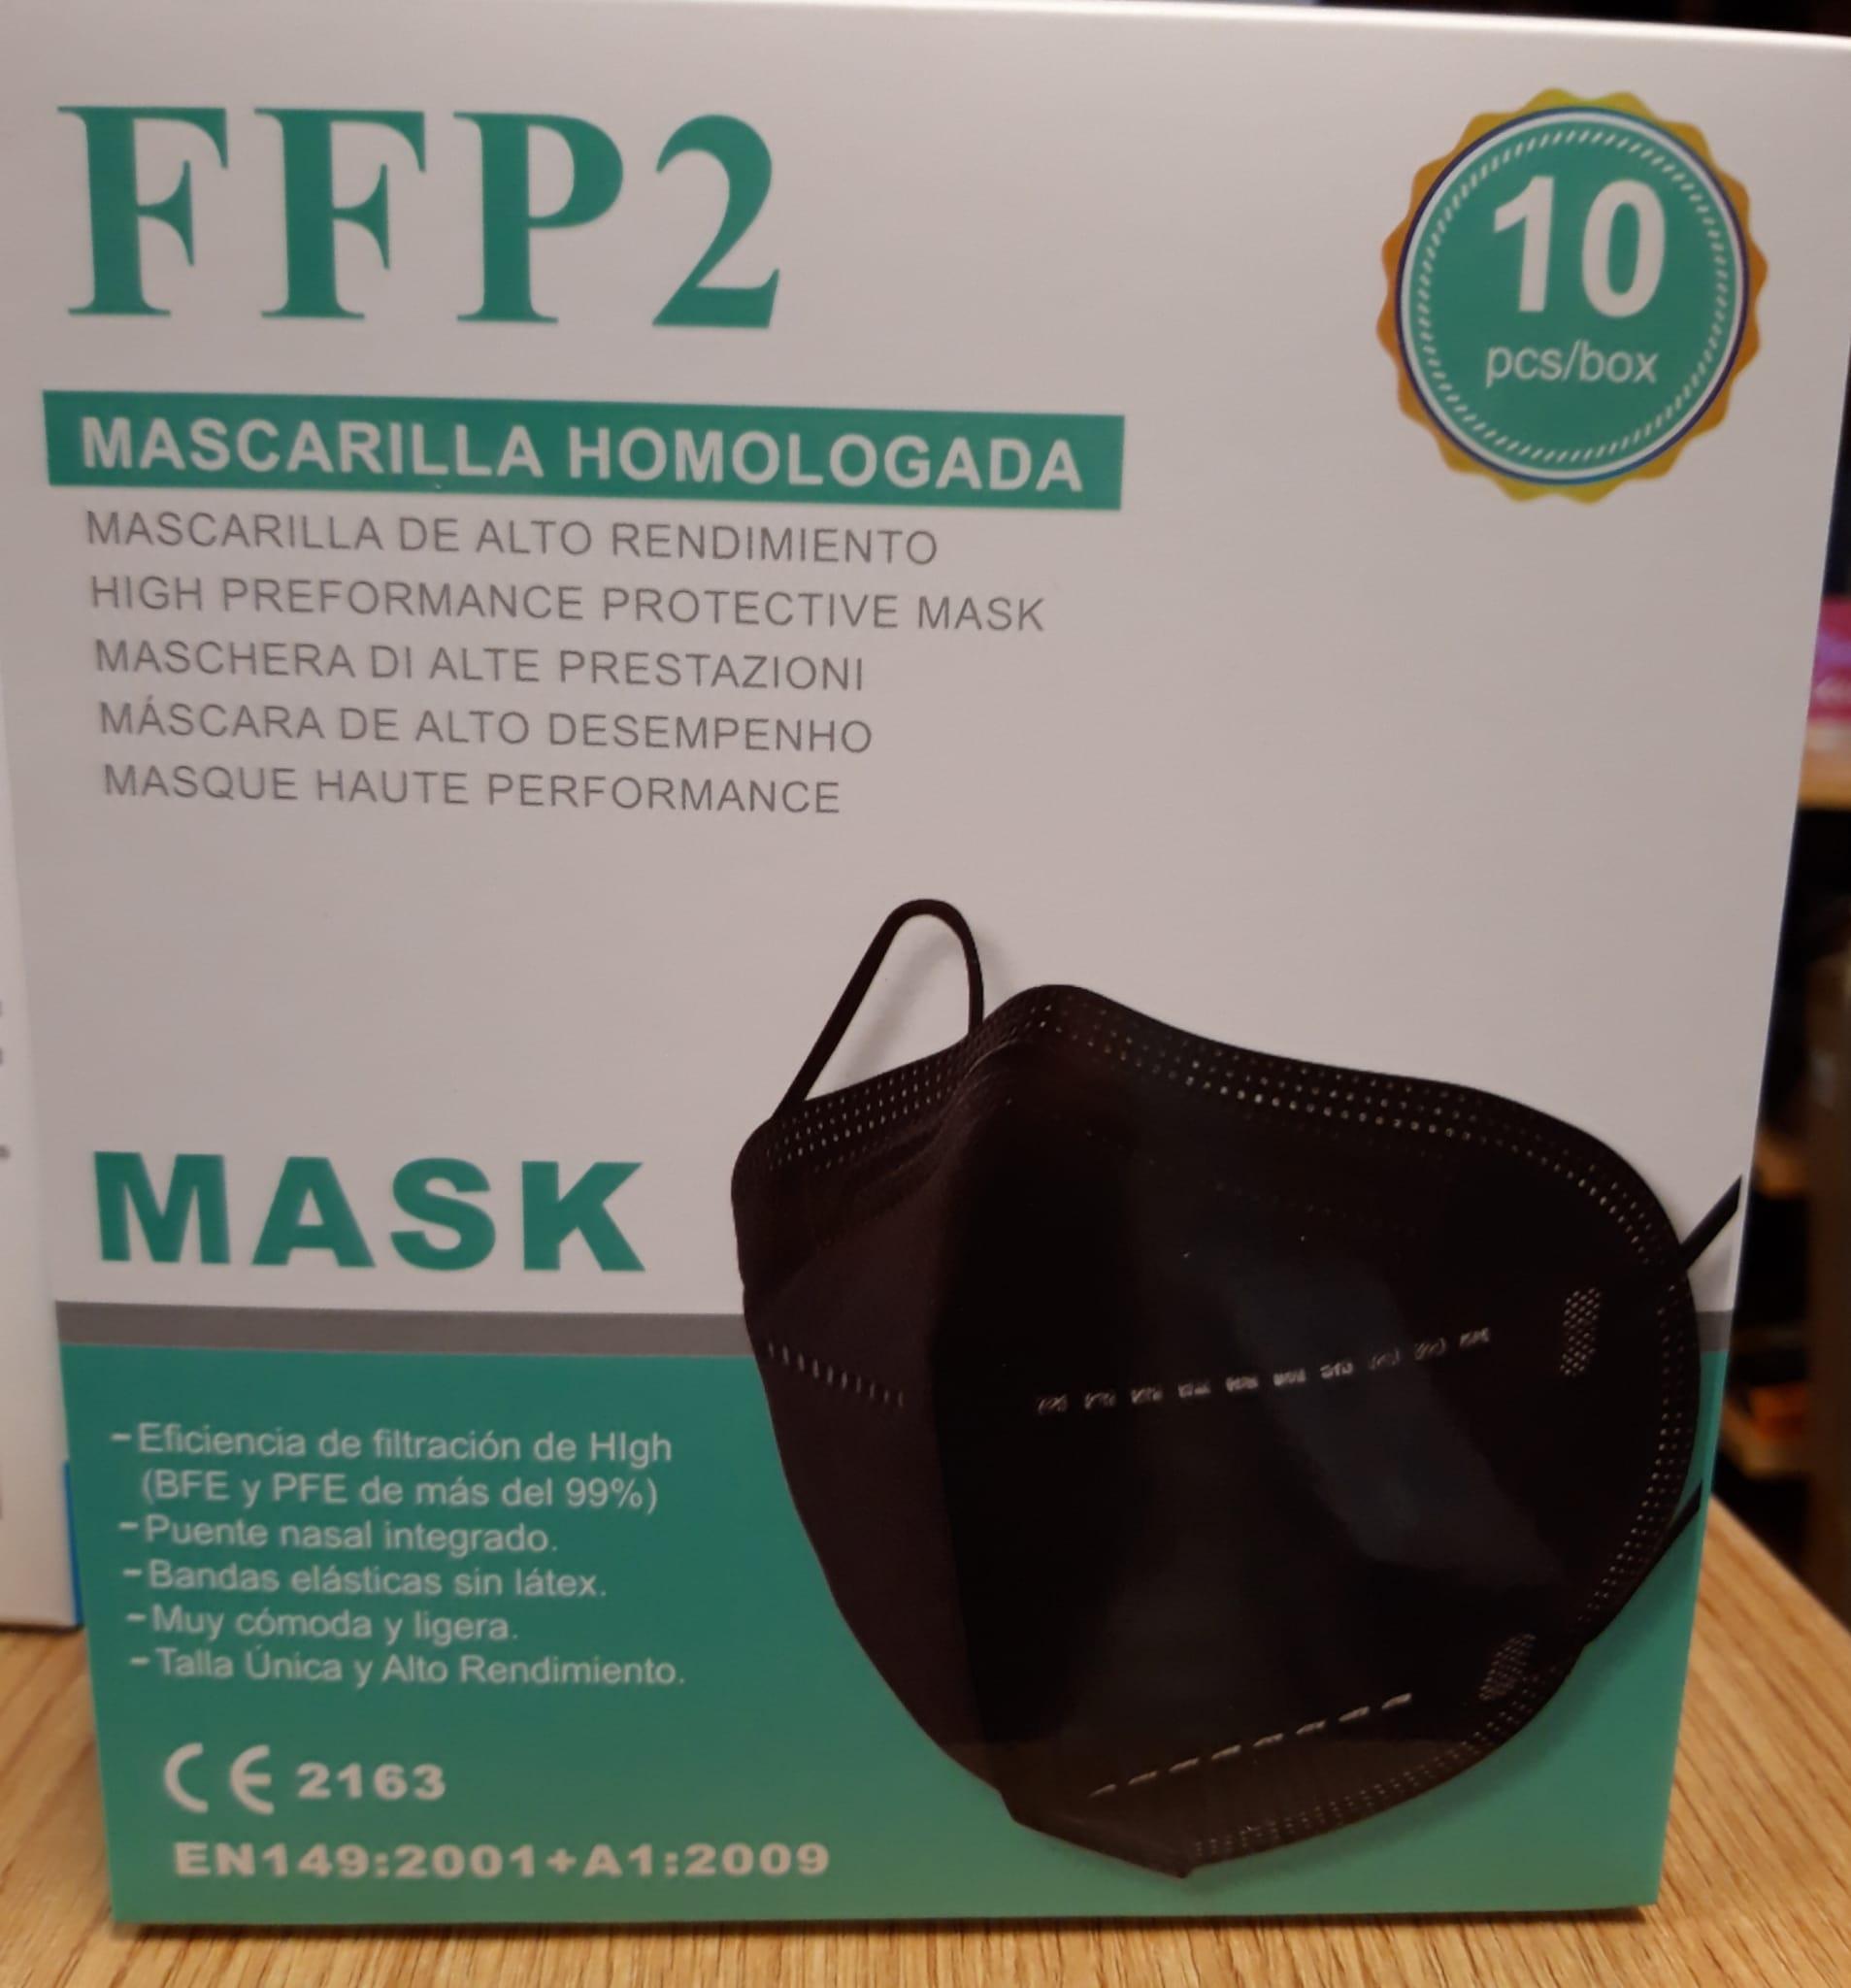 Mascarilla FFP2 Negra Pack 10 unidades